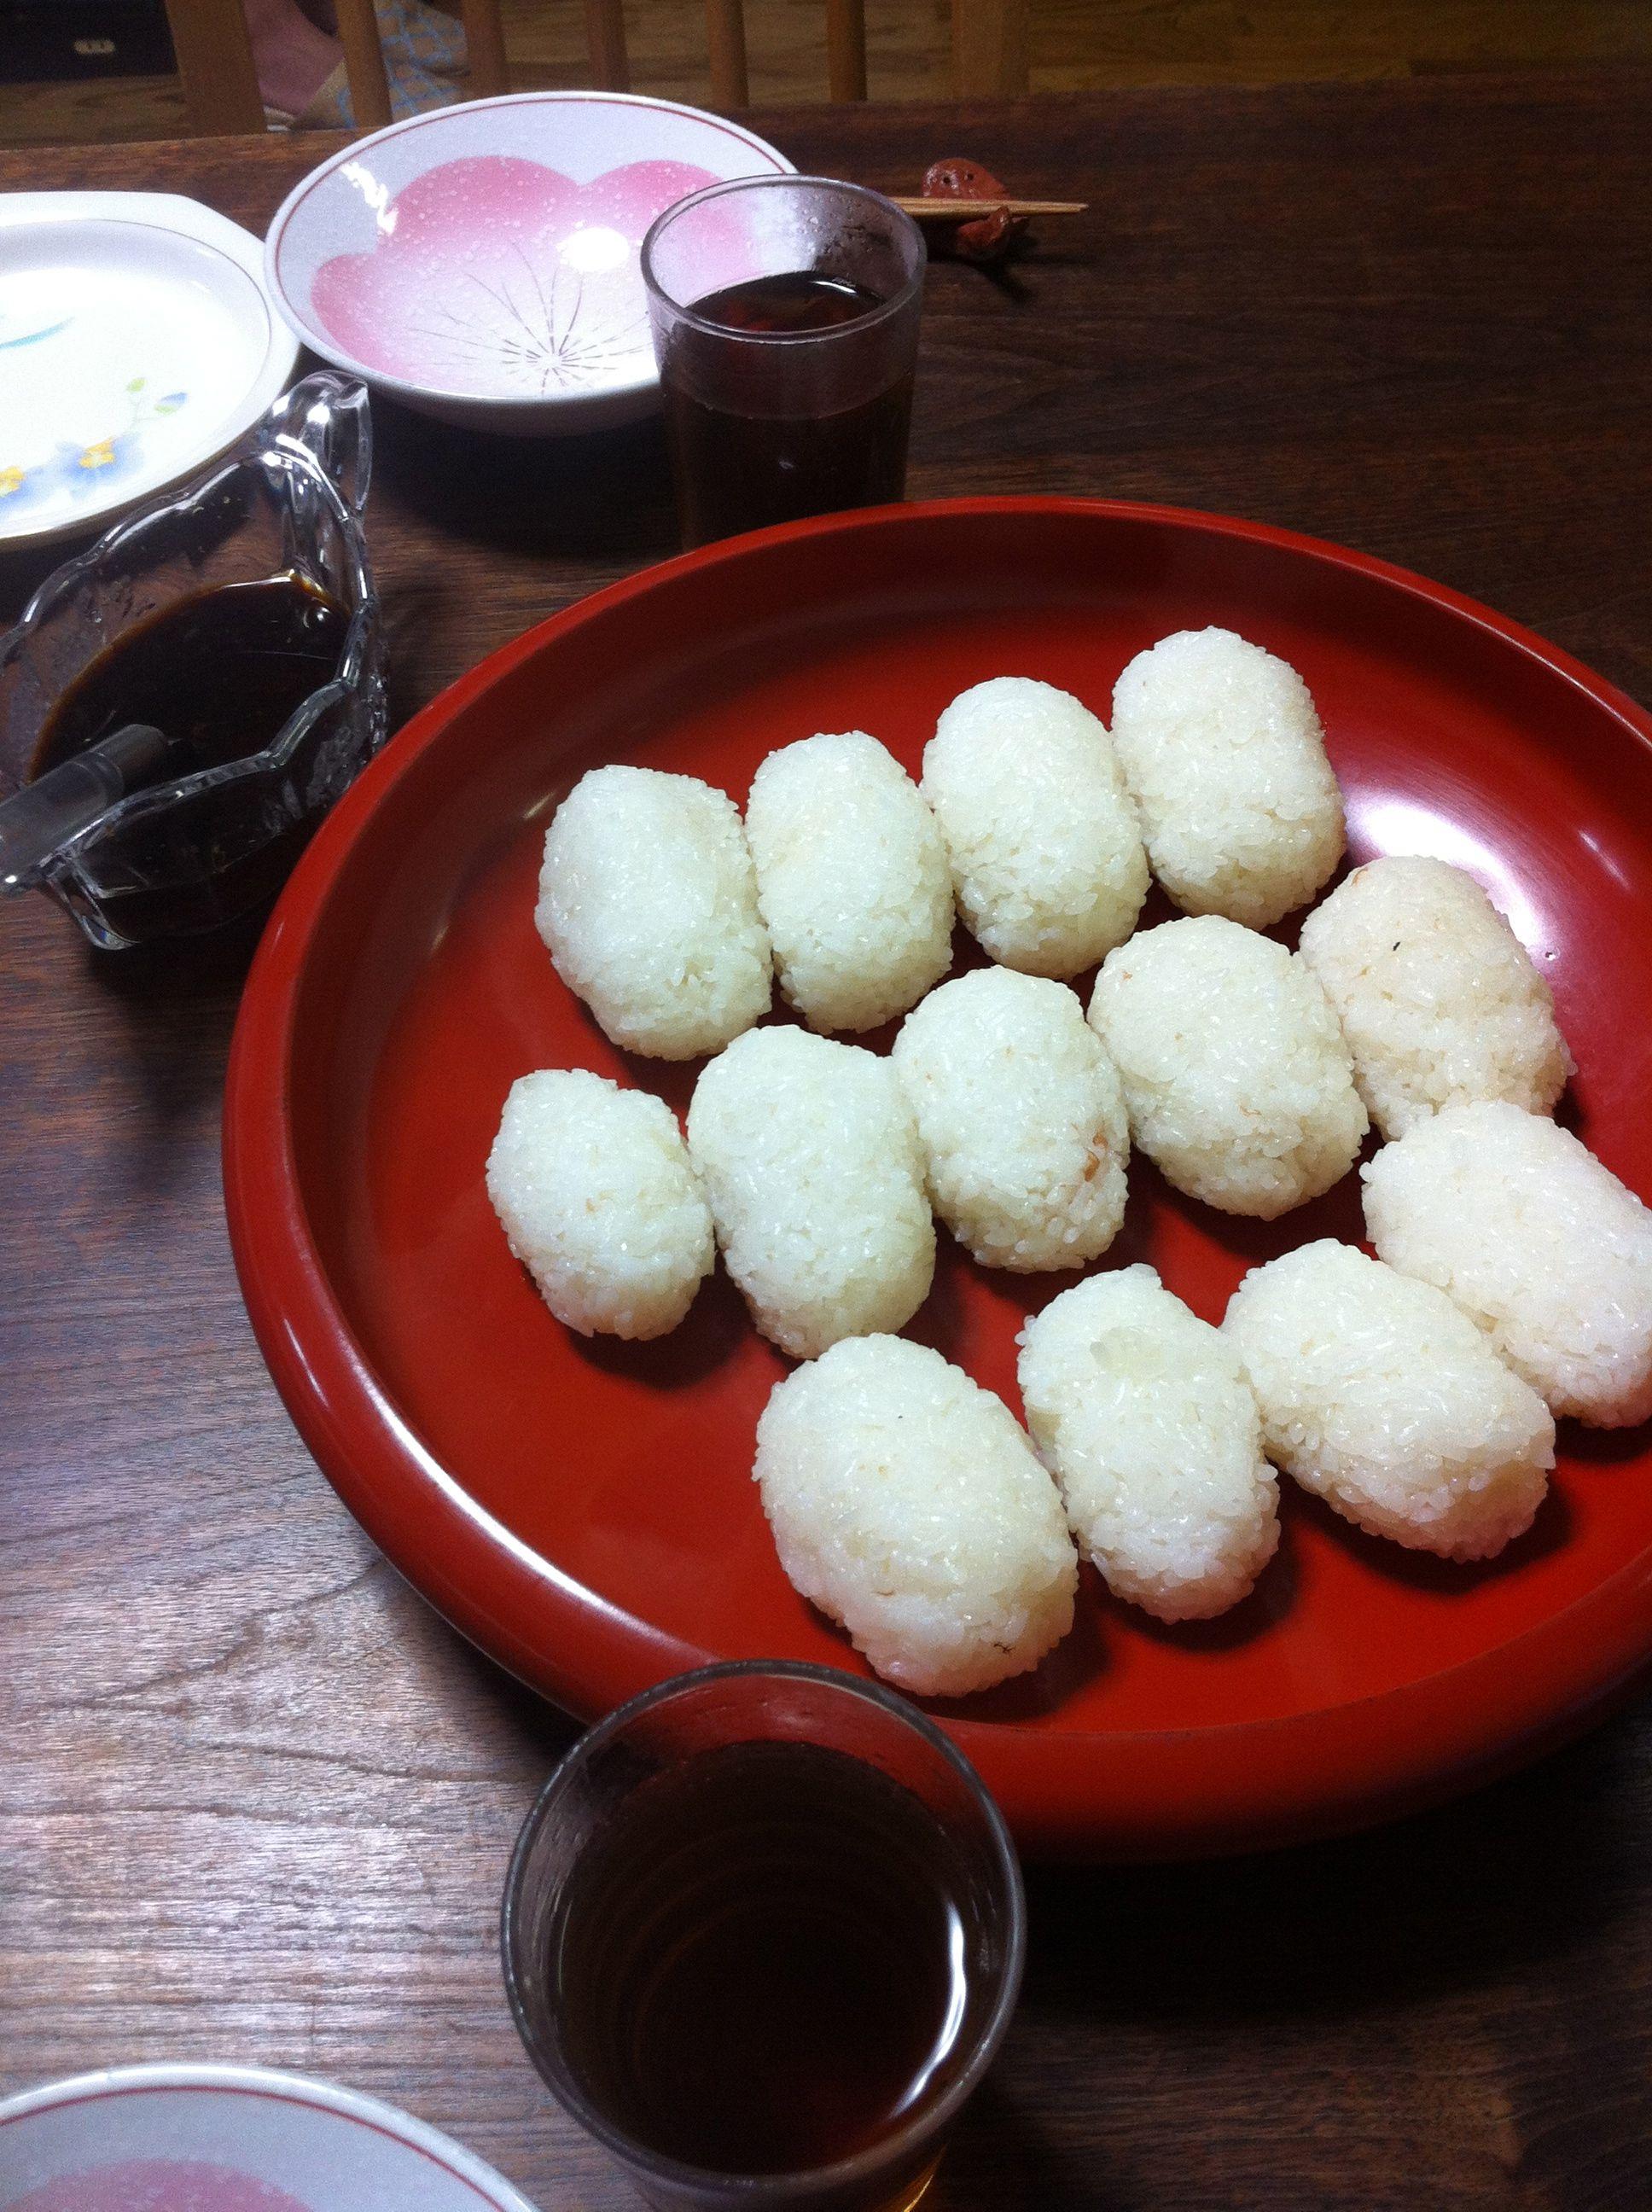 Homemade rice balls. | Food, Yummy food, Japan food